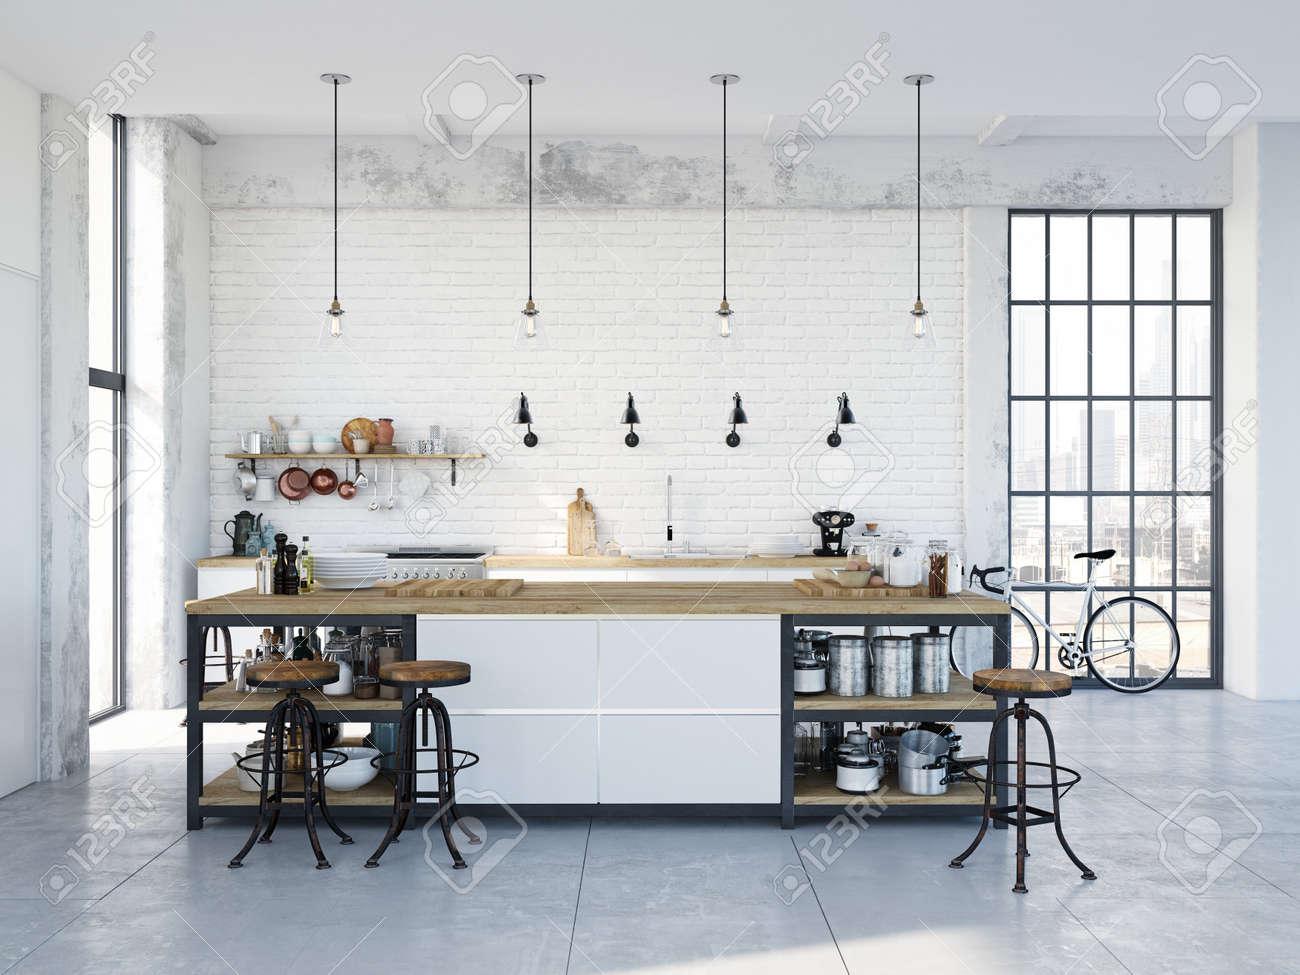 modern nordic kitchen in loft apartment. 3D rendering - 79134046